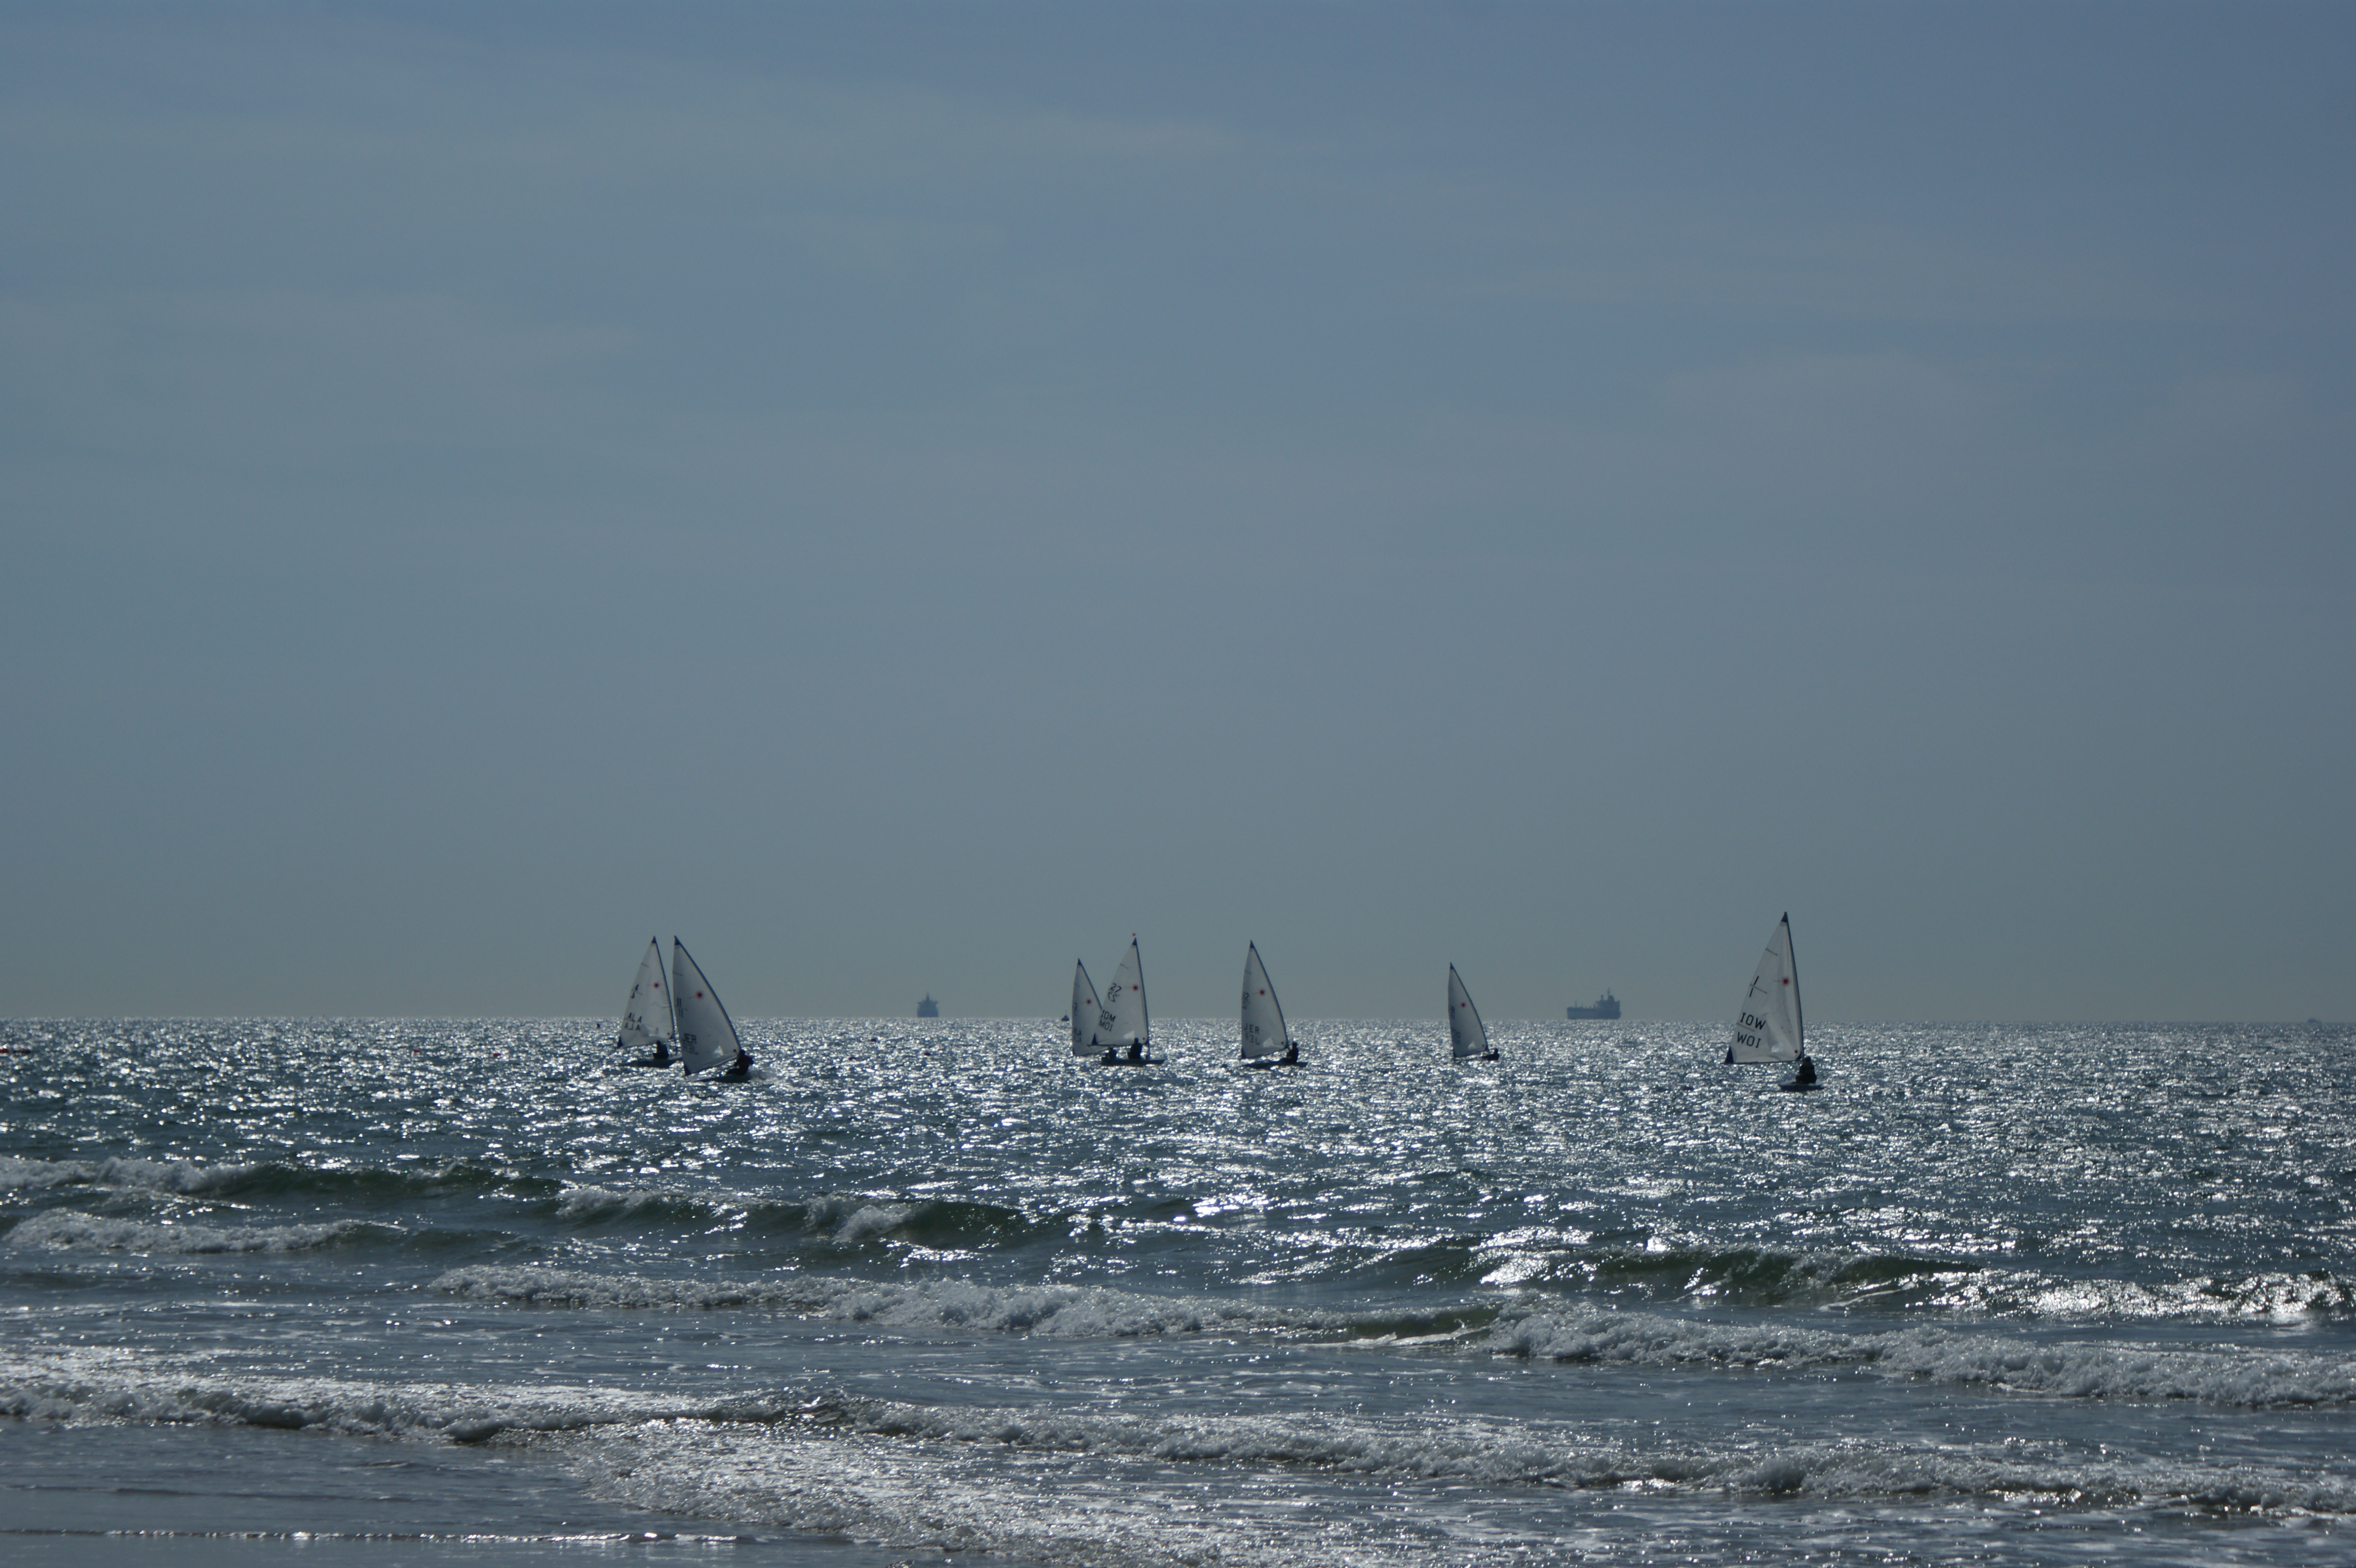 The Island Sailing Club